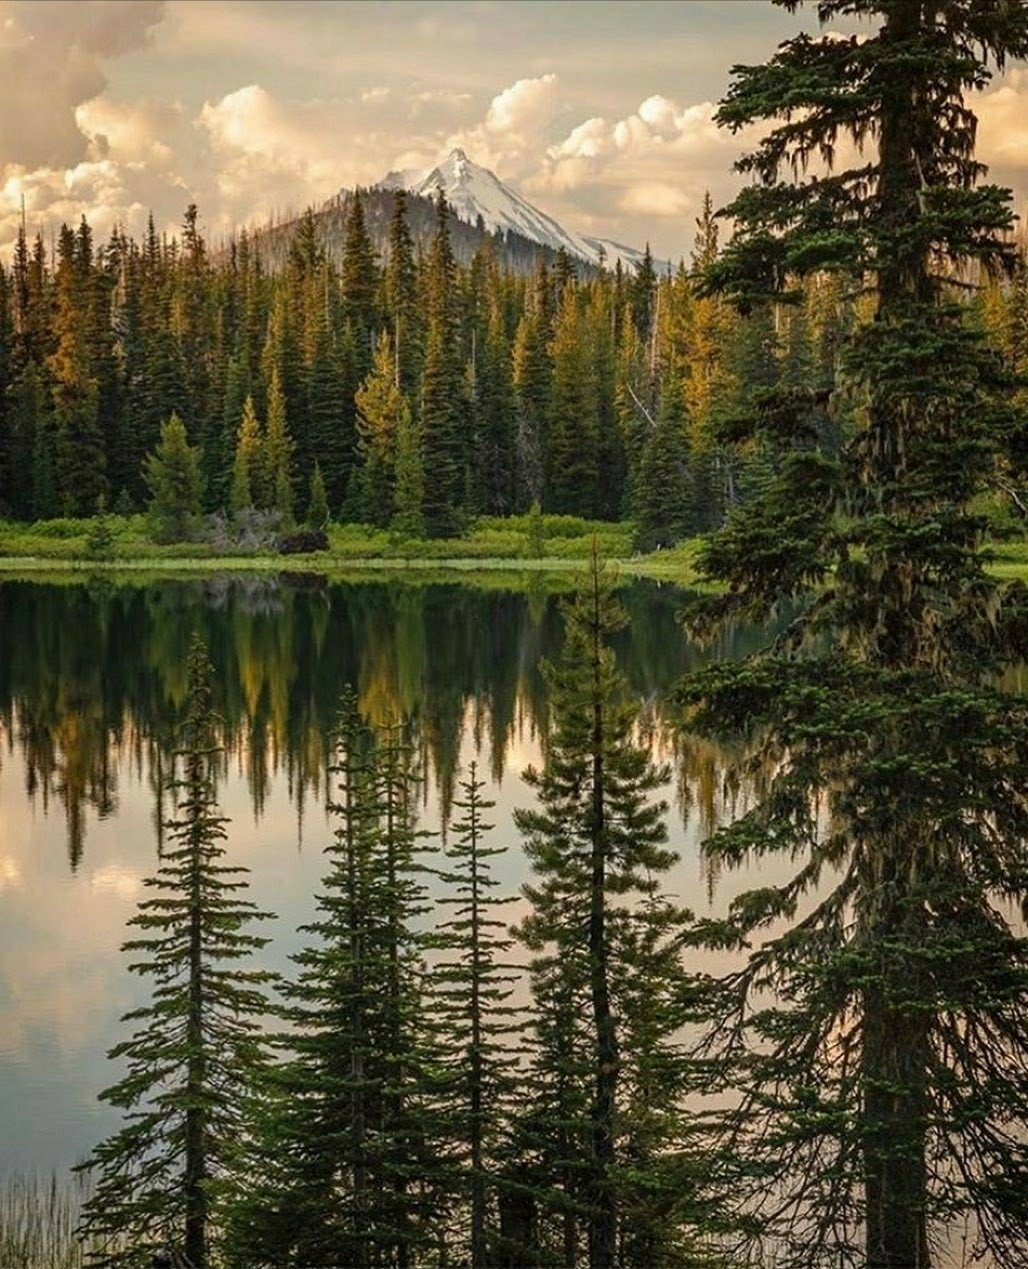 Mount Jefferson Wilderness